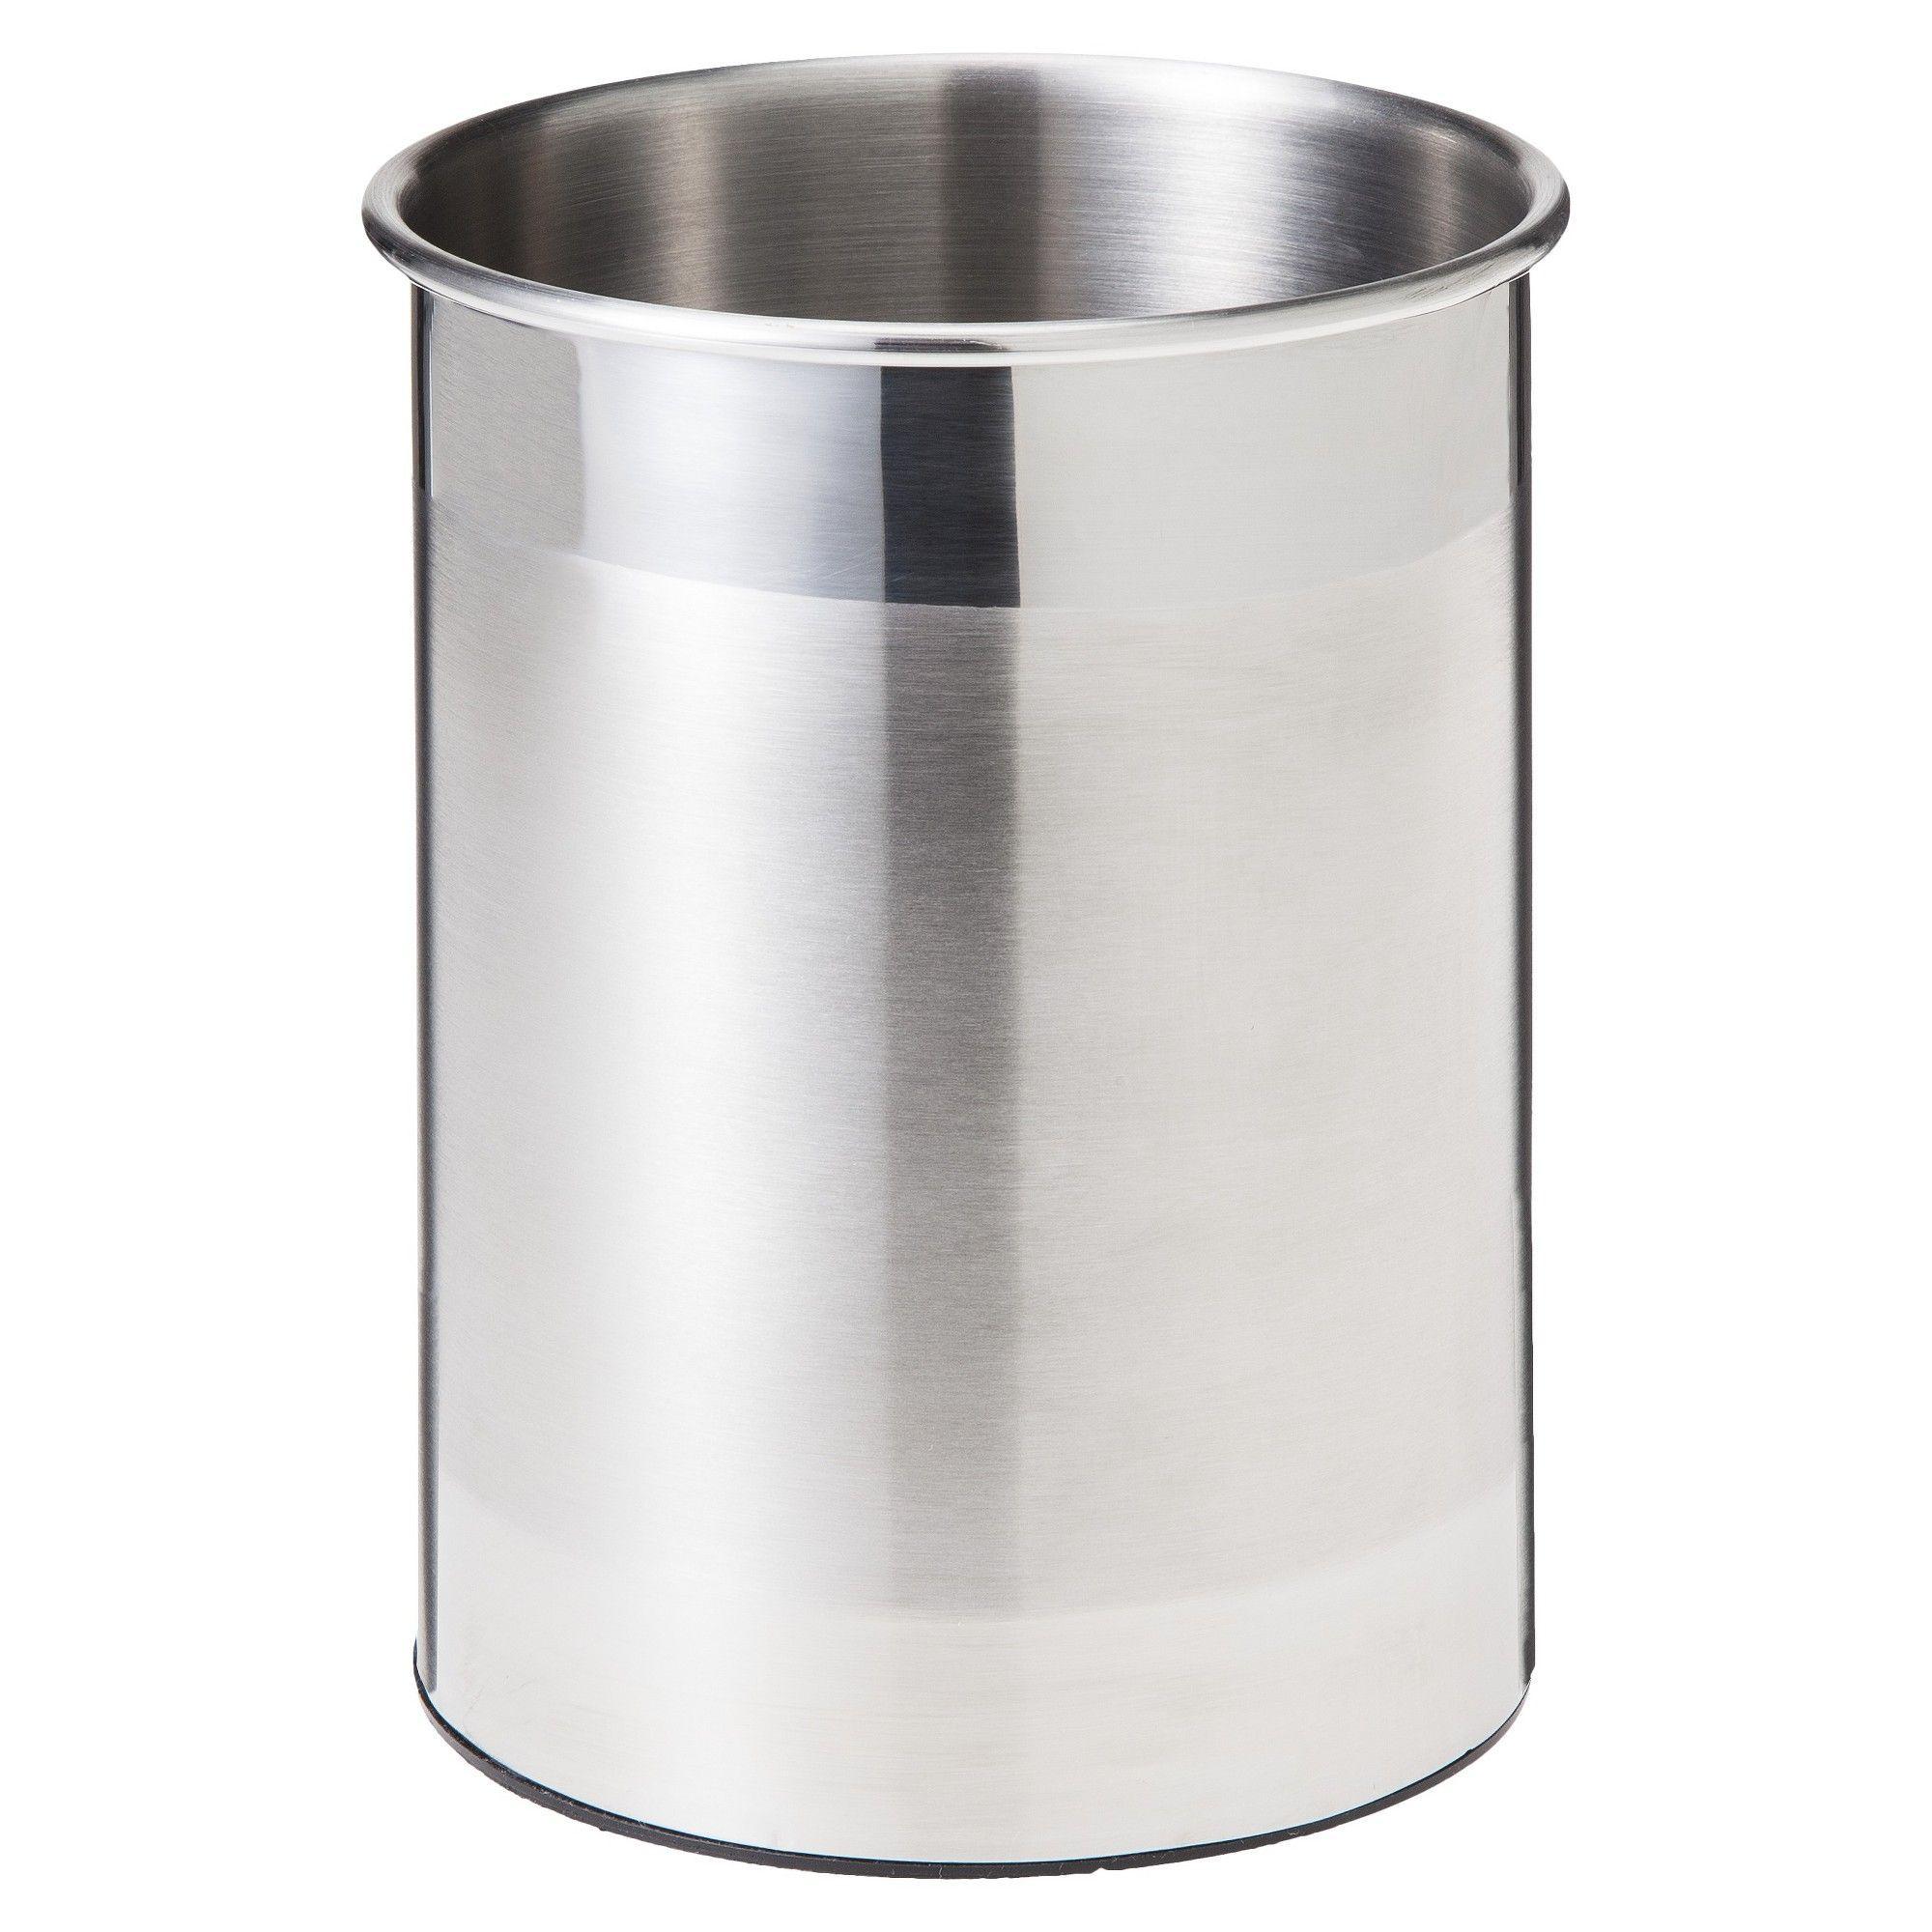 Stainless Steel Utensil Storage Container - Threshold ...